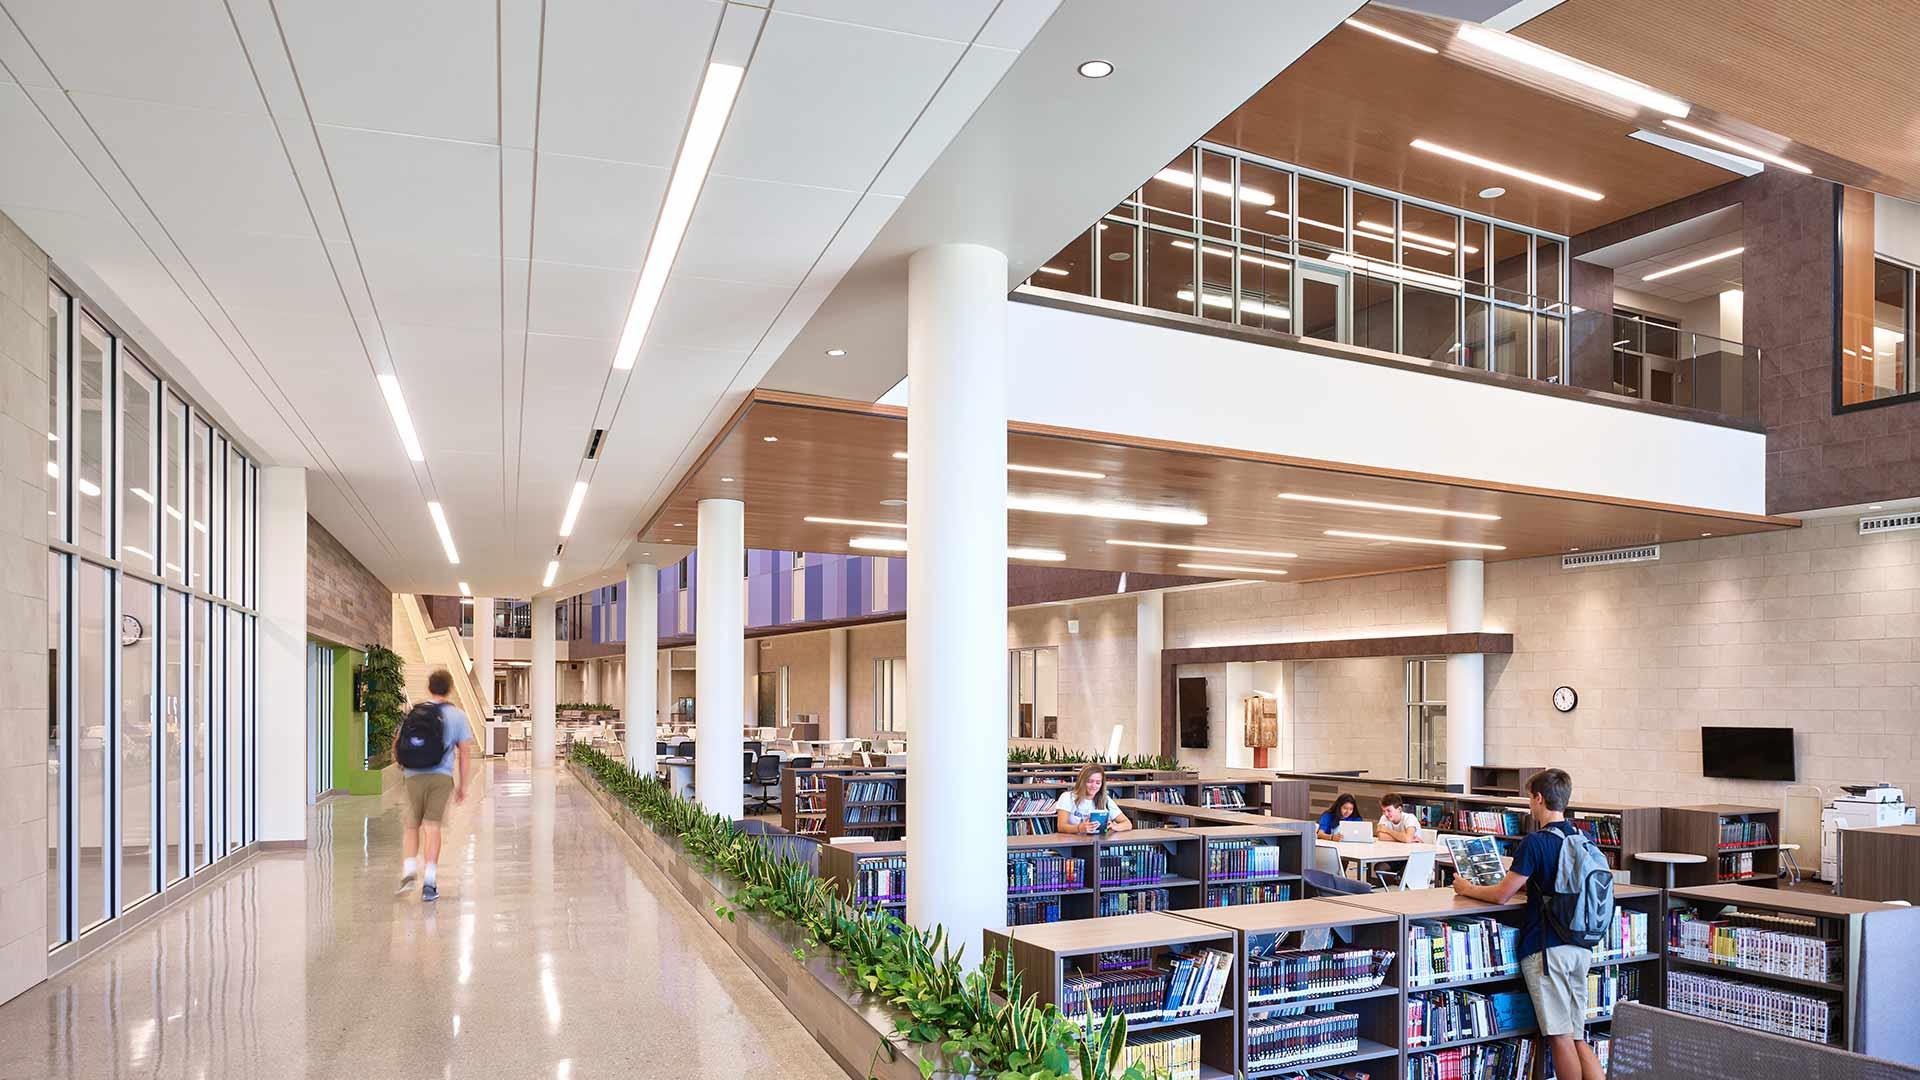 Olathe west high school hollis miller - Interior design curriculum high school ...